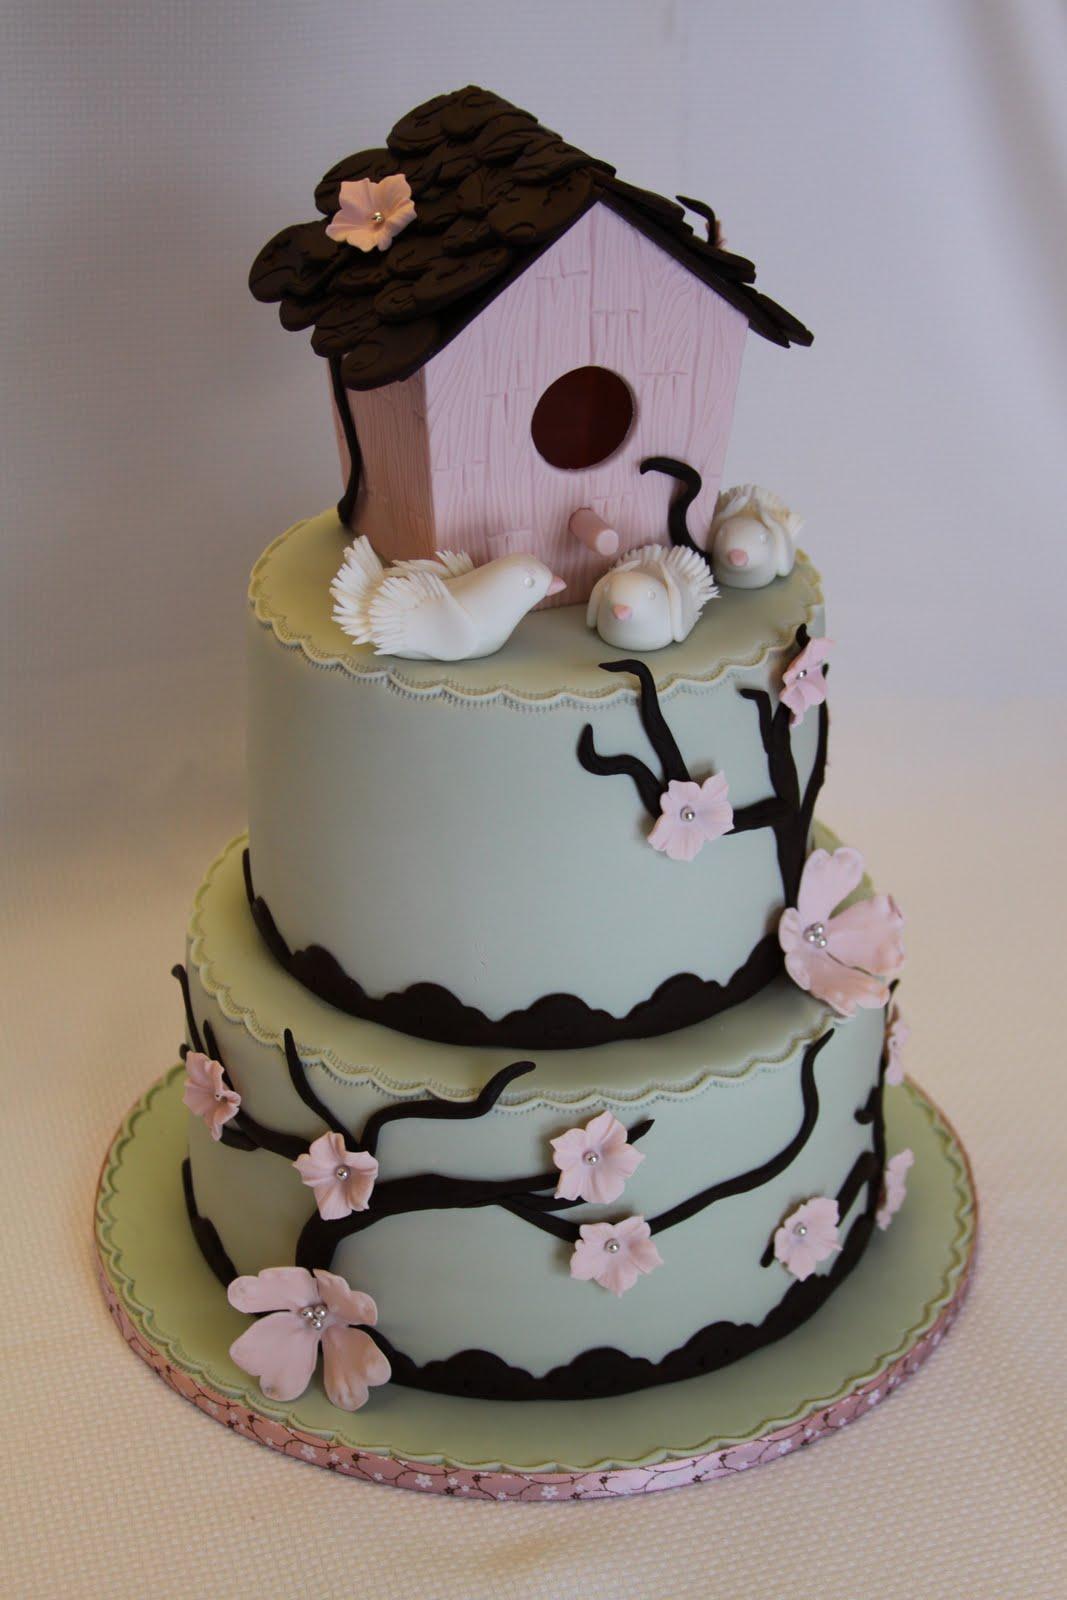 .: Birdhouse Housewarming Cake